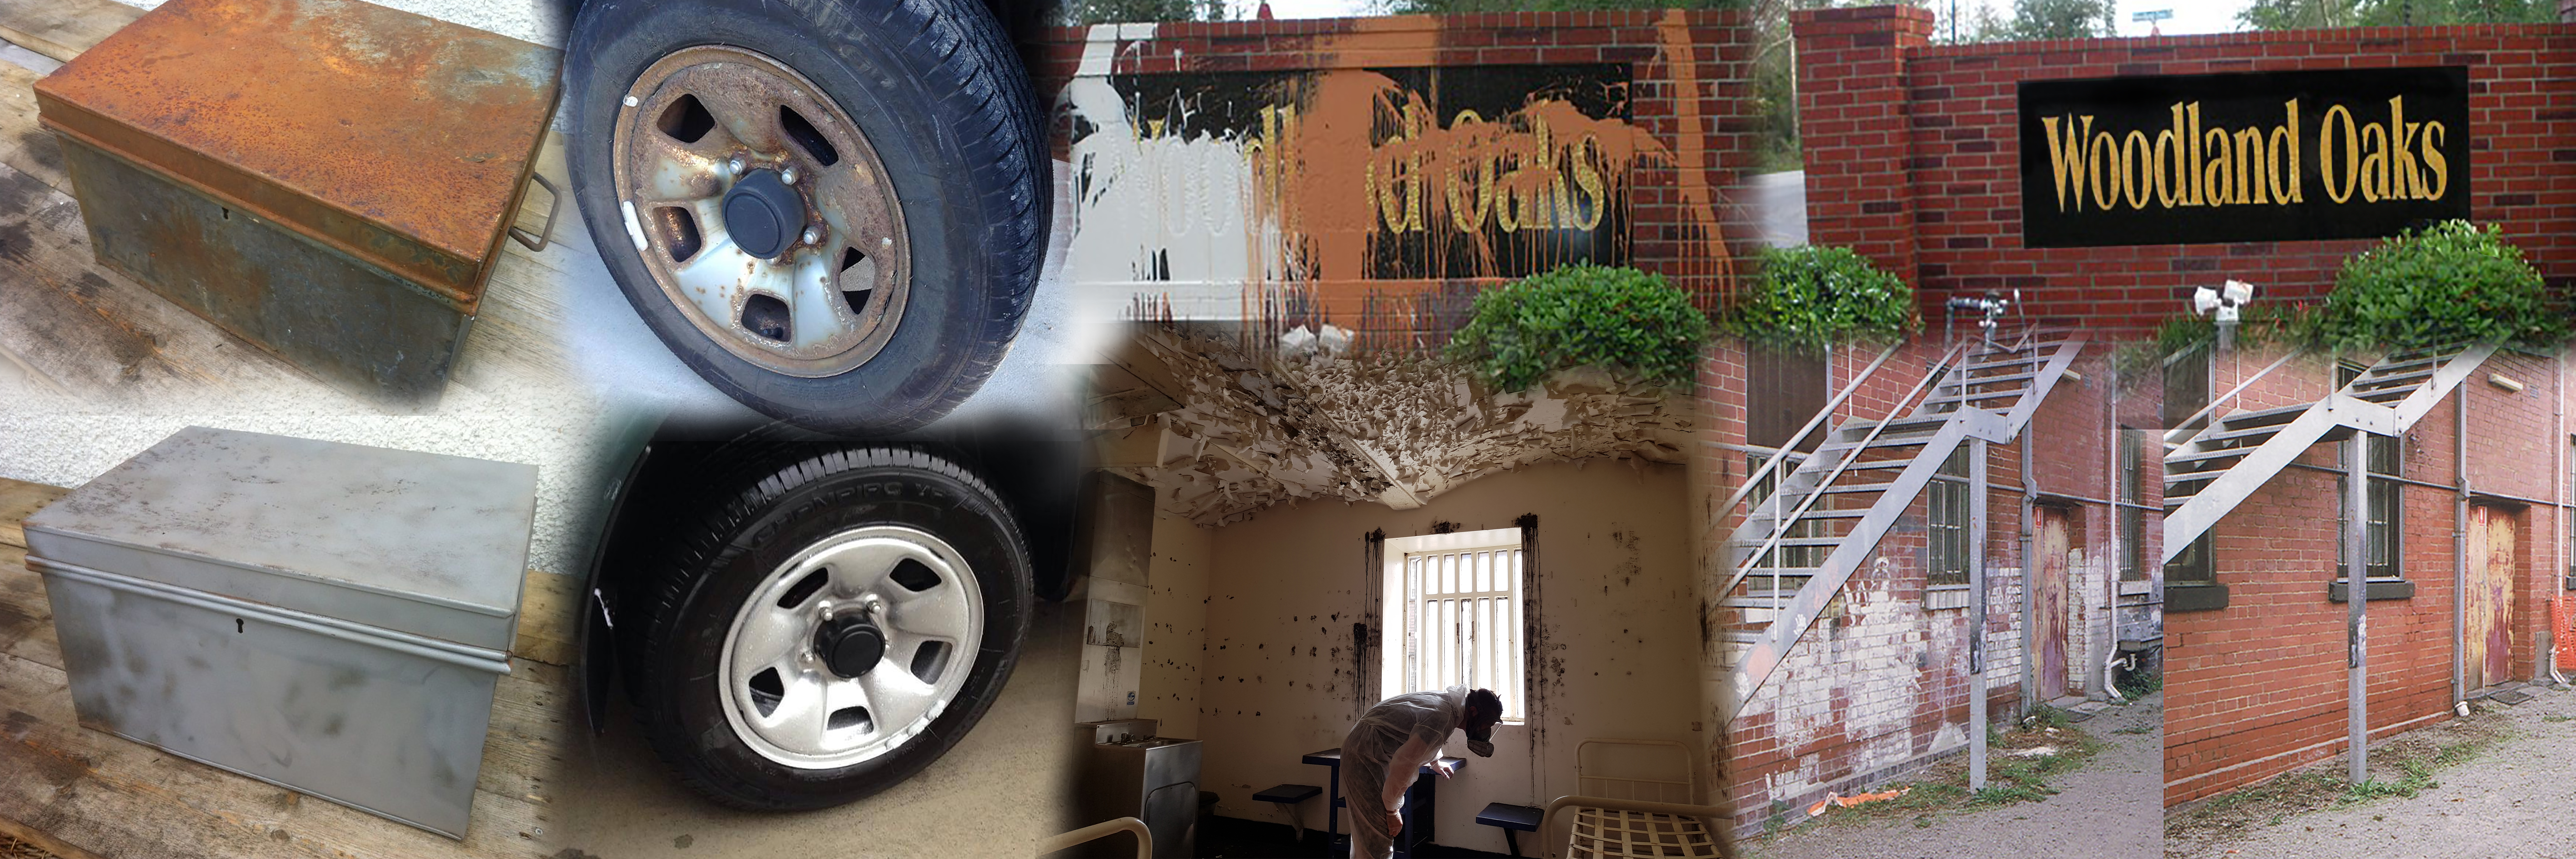 graffiti-removal-and-blast-restoration